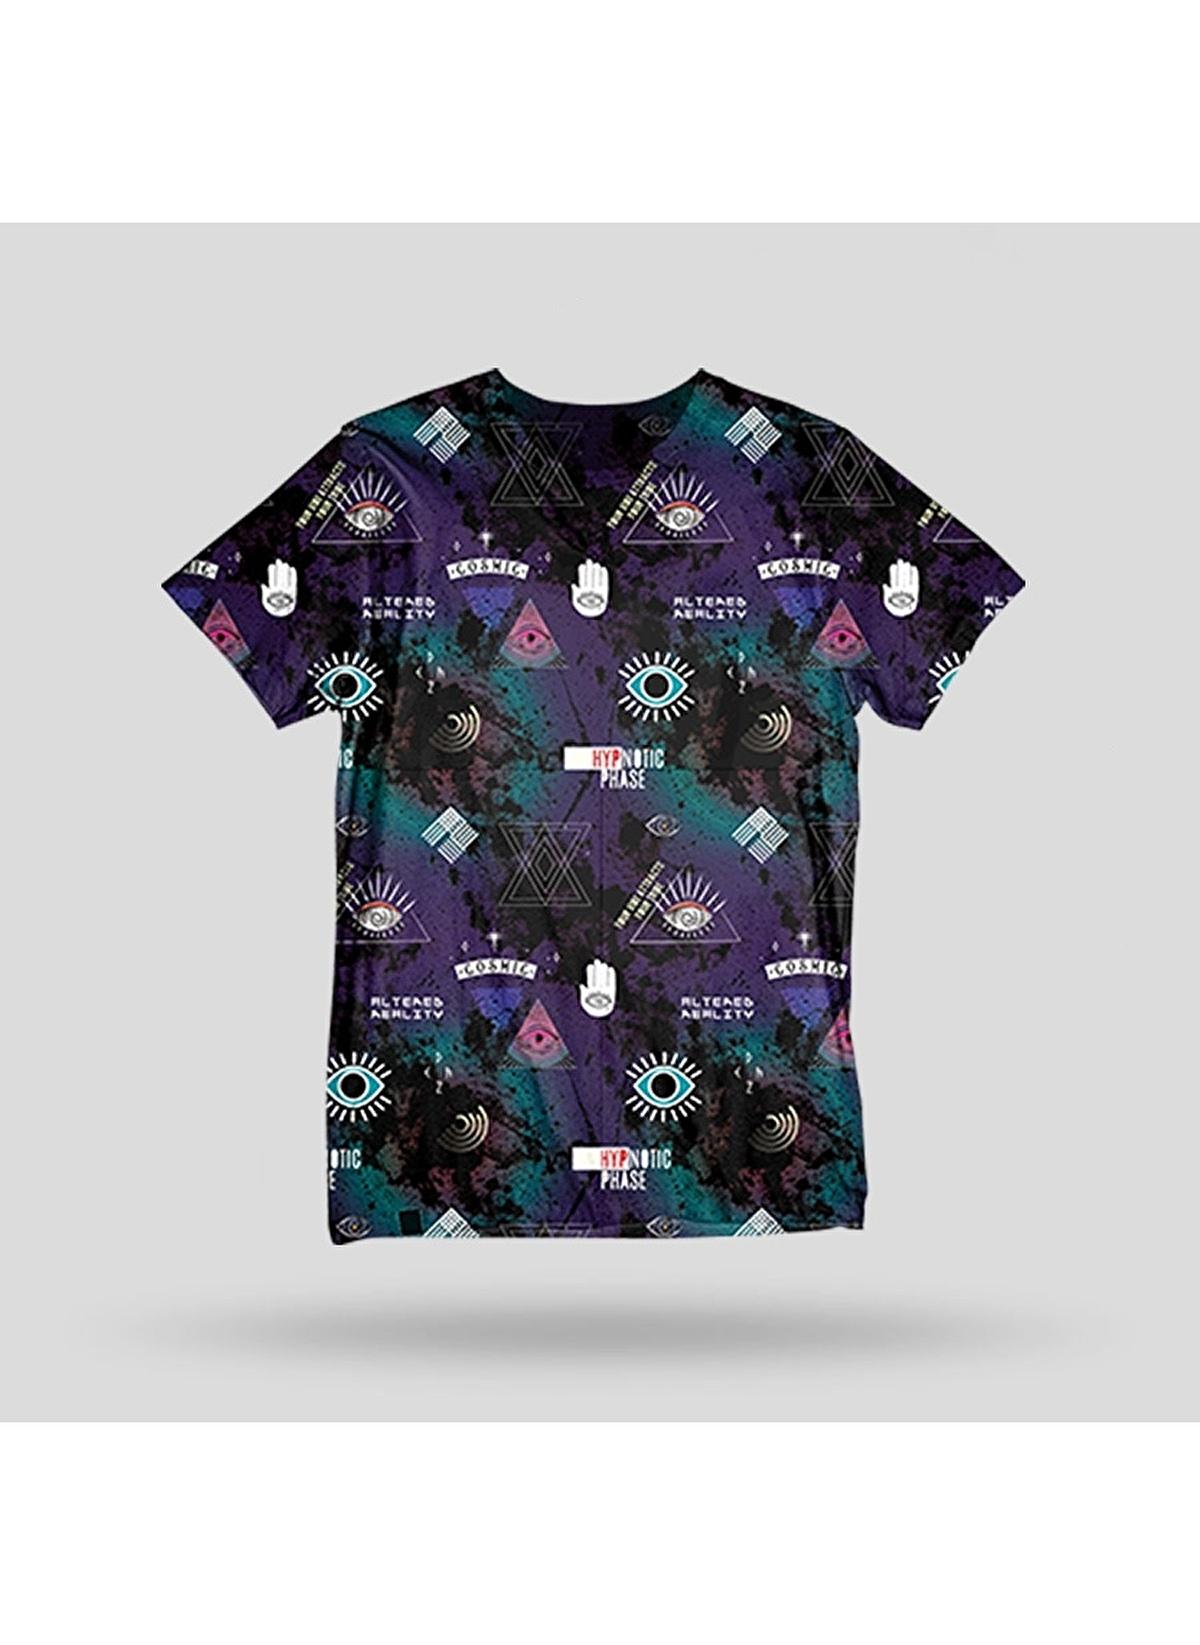 John Frank Tişört Jftd36-hypnotıc Baskılı Dijital T-shirt – 79.99 TL